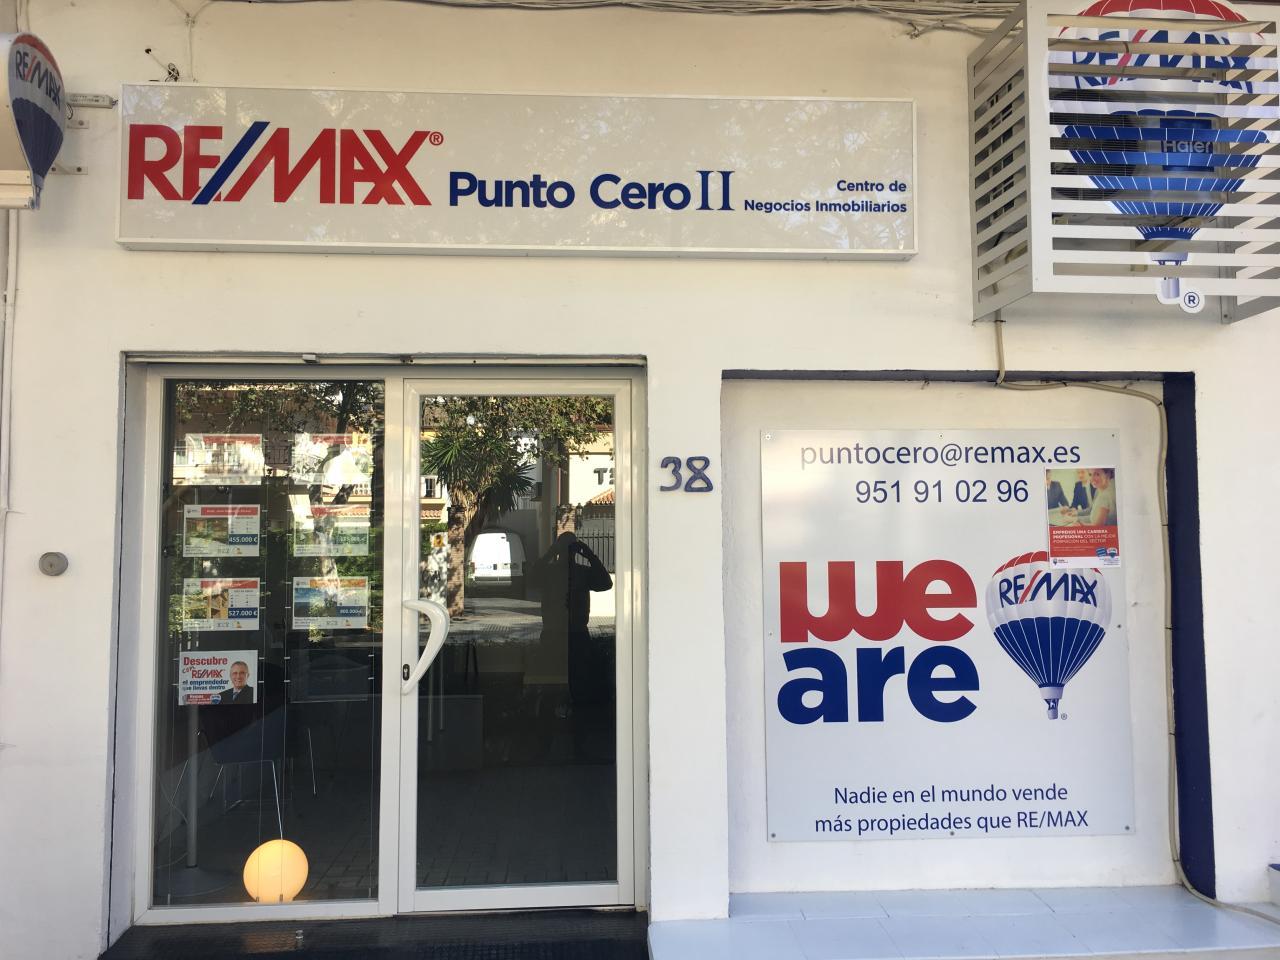 RE/MAX Punto Cero II